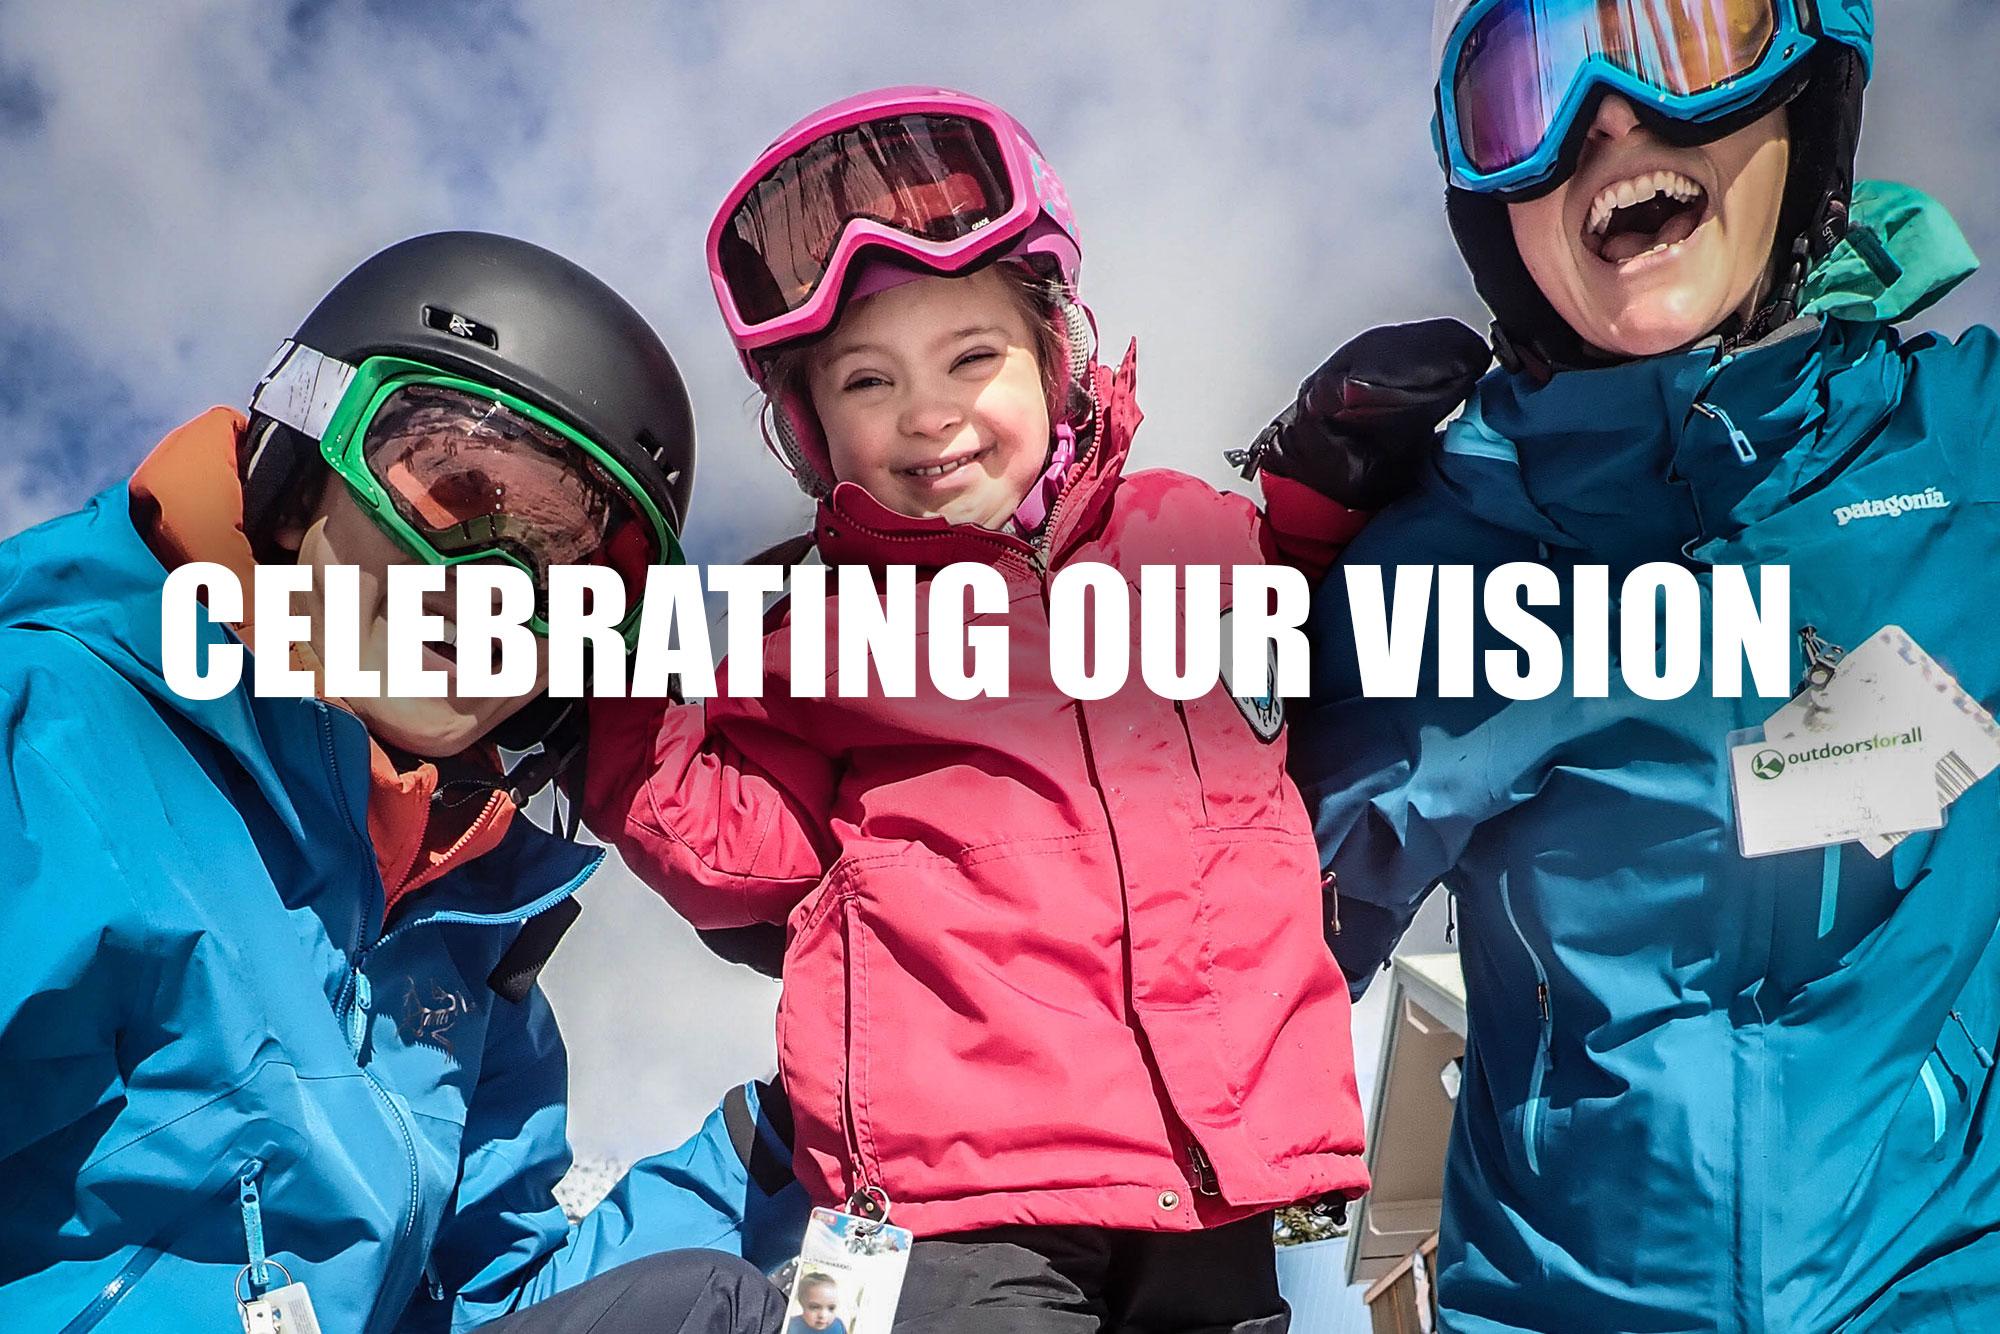 Celebrating Vision